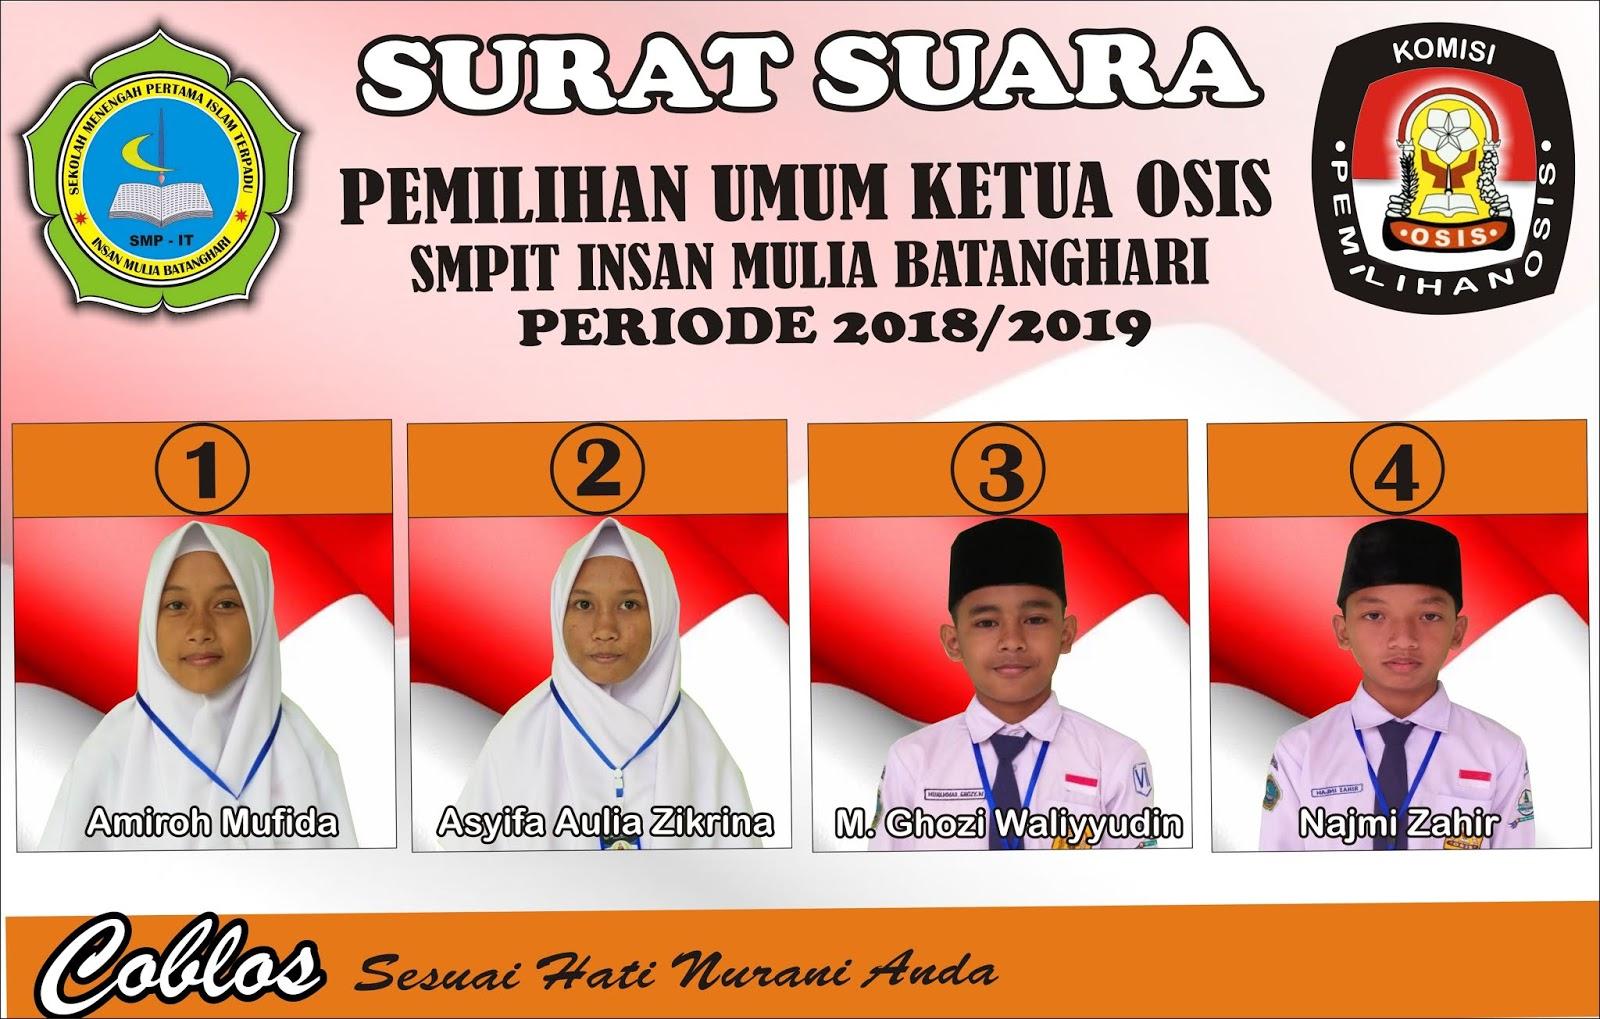 Smp It Insan Mulia Batanghari Lampung Timur Im Batanghari